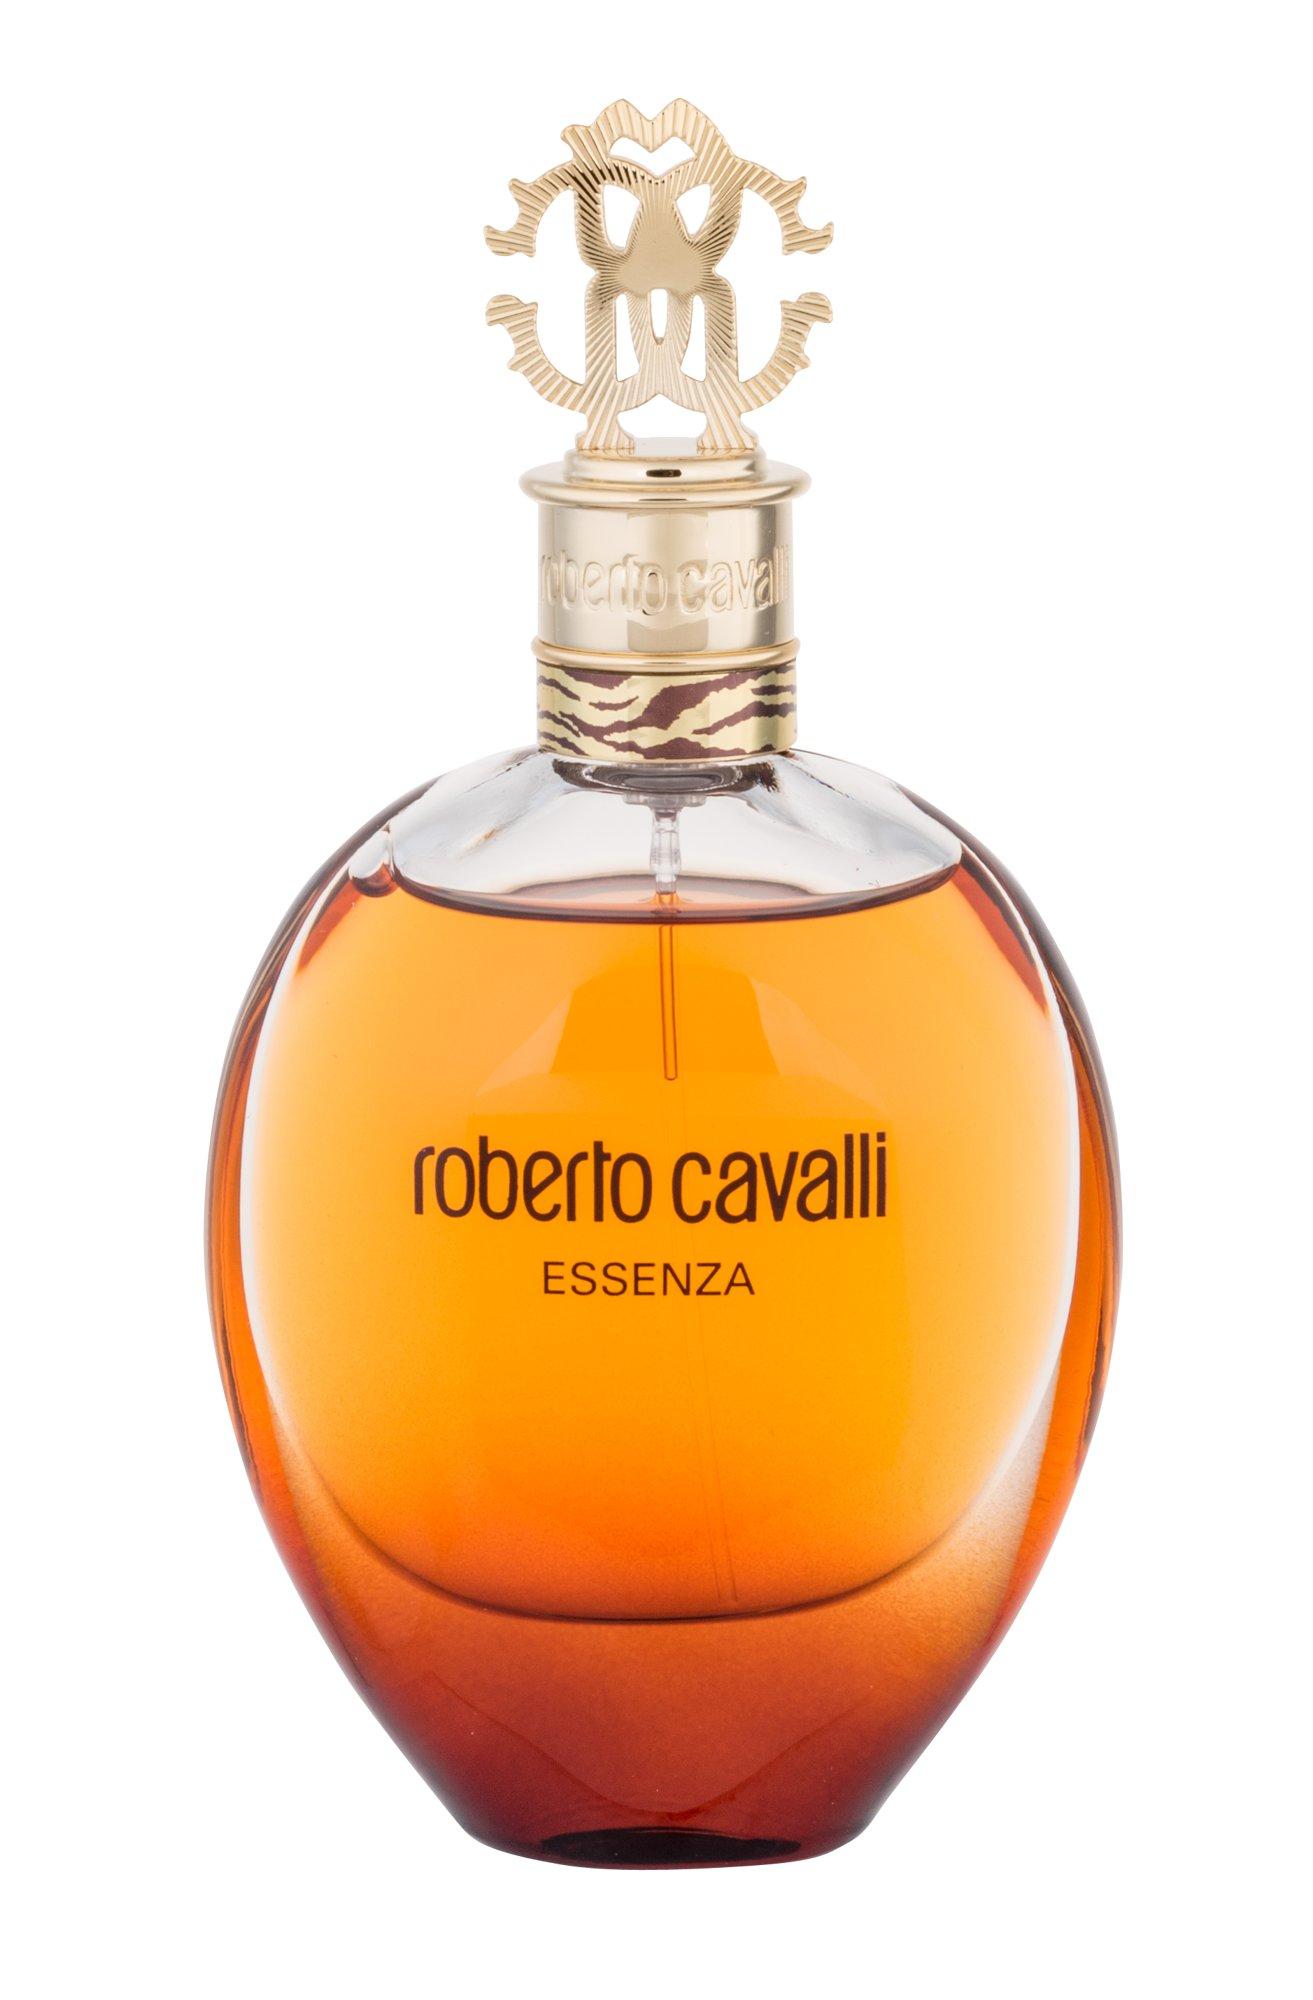 Roberto Cavalli Essenza, edp 75ml